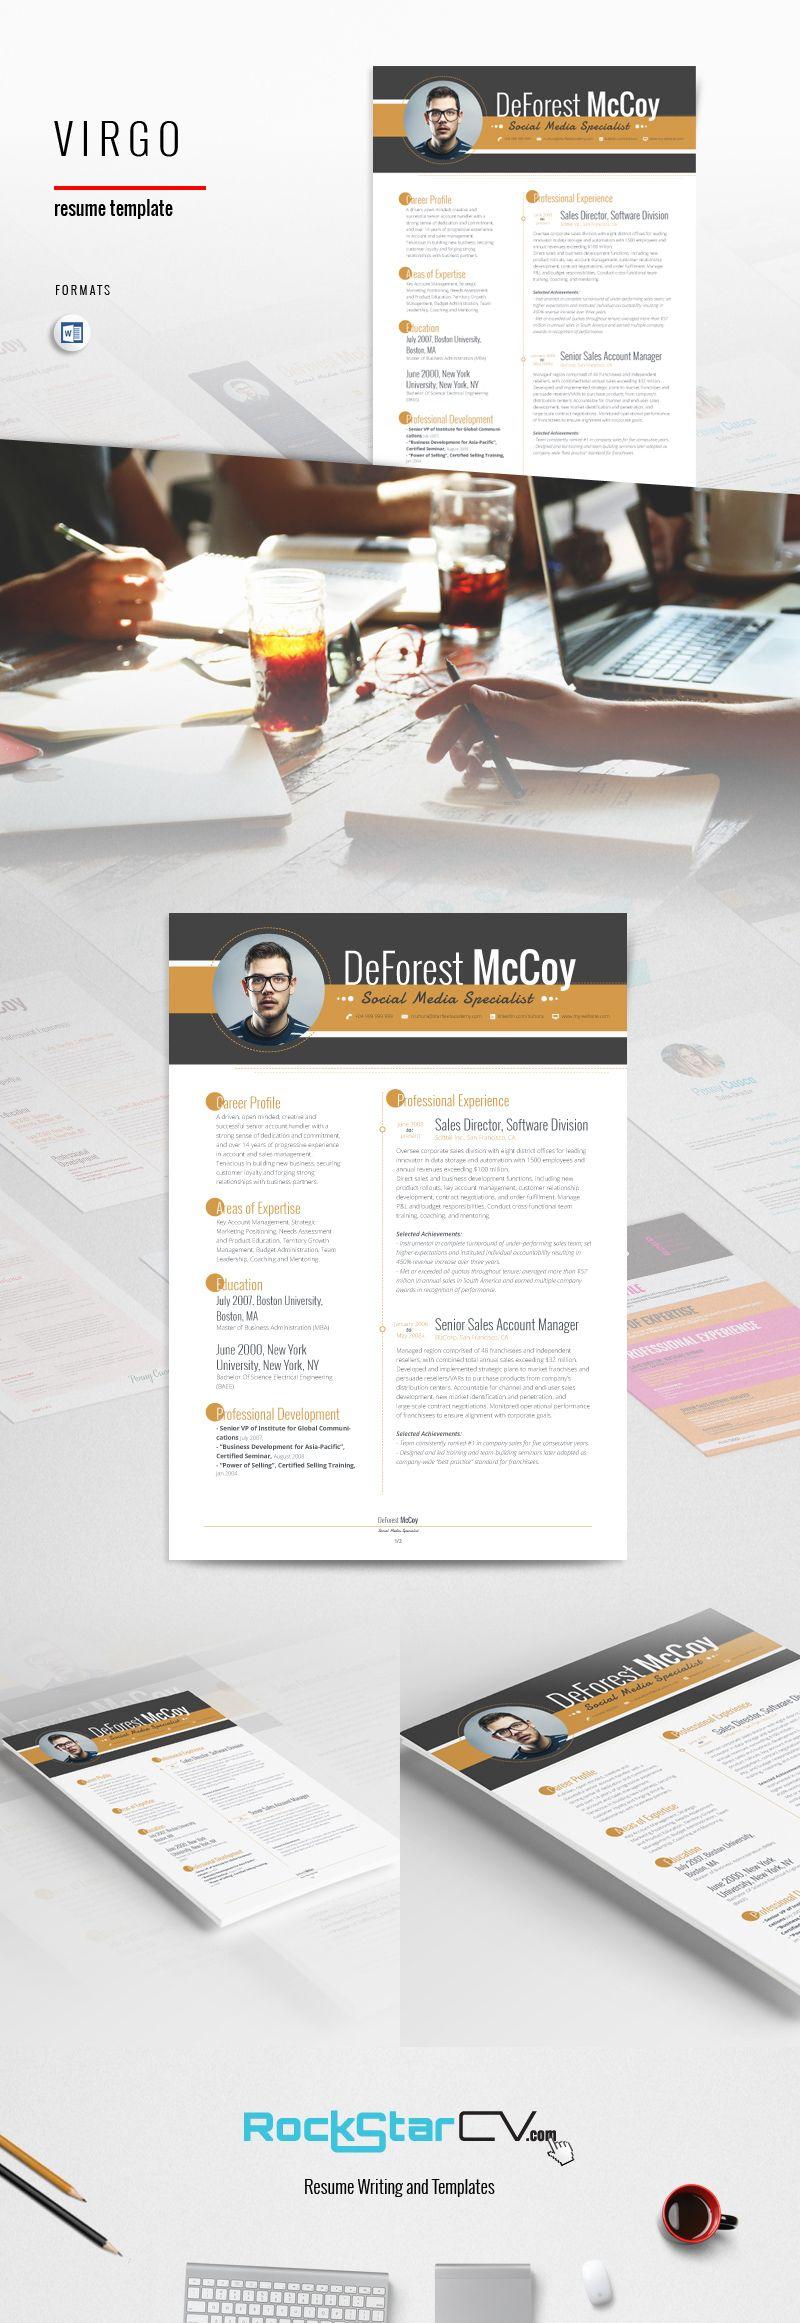 Modern Resume Format Cool Virgo Resume Template  Httprockstarcvproductvirgoresume Decorating Design